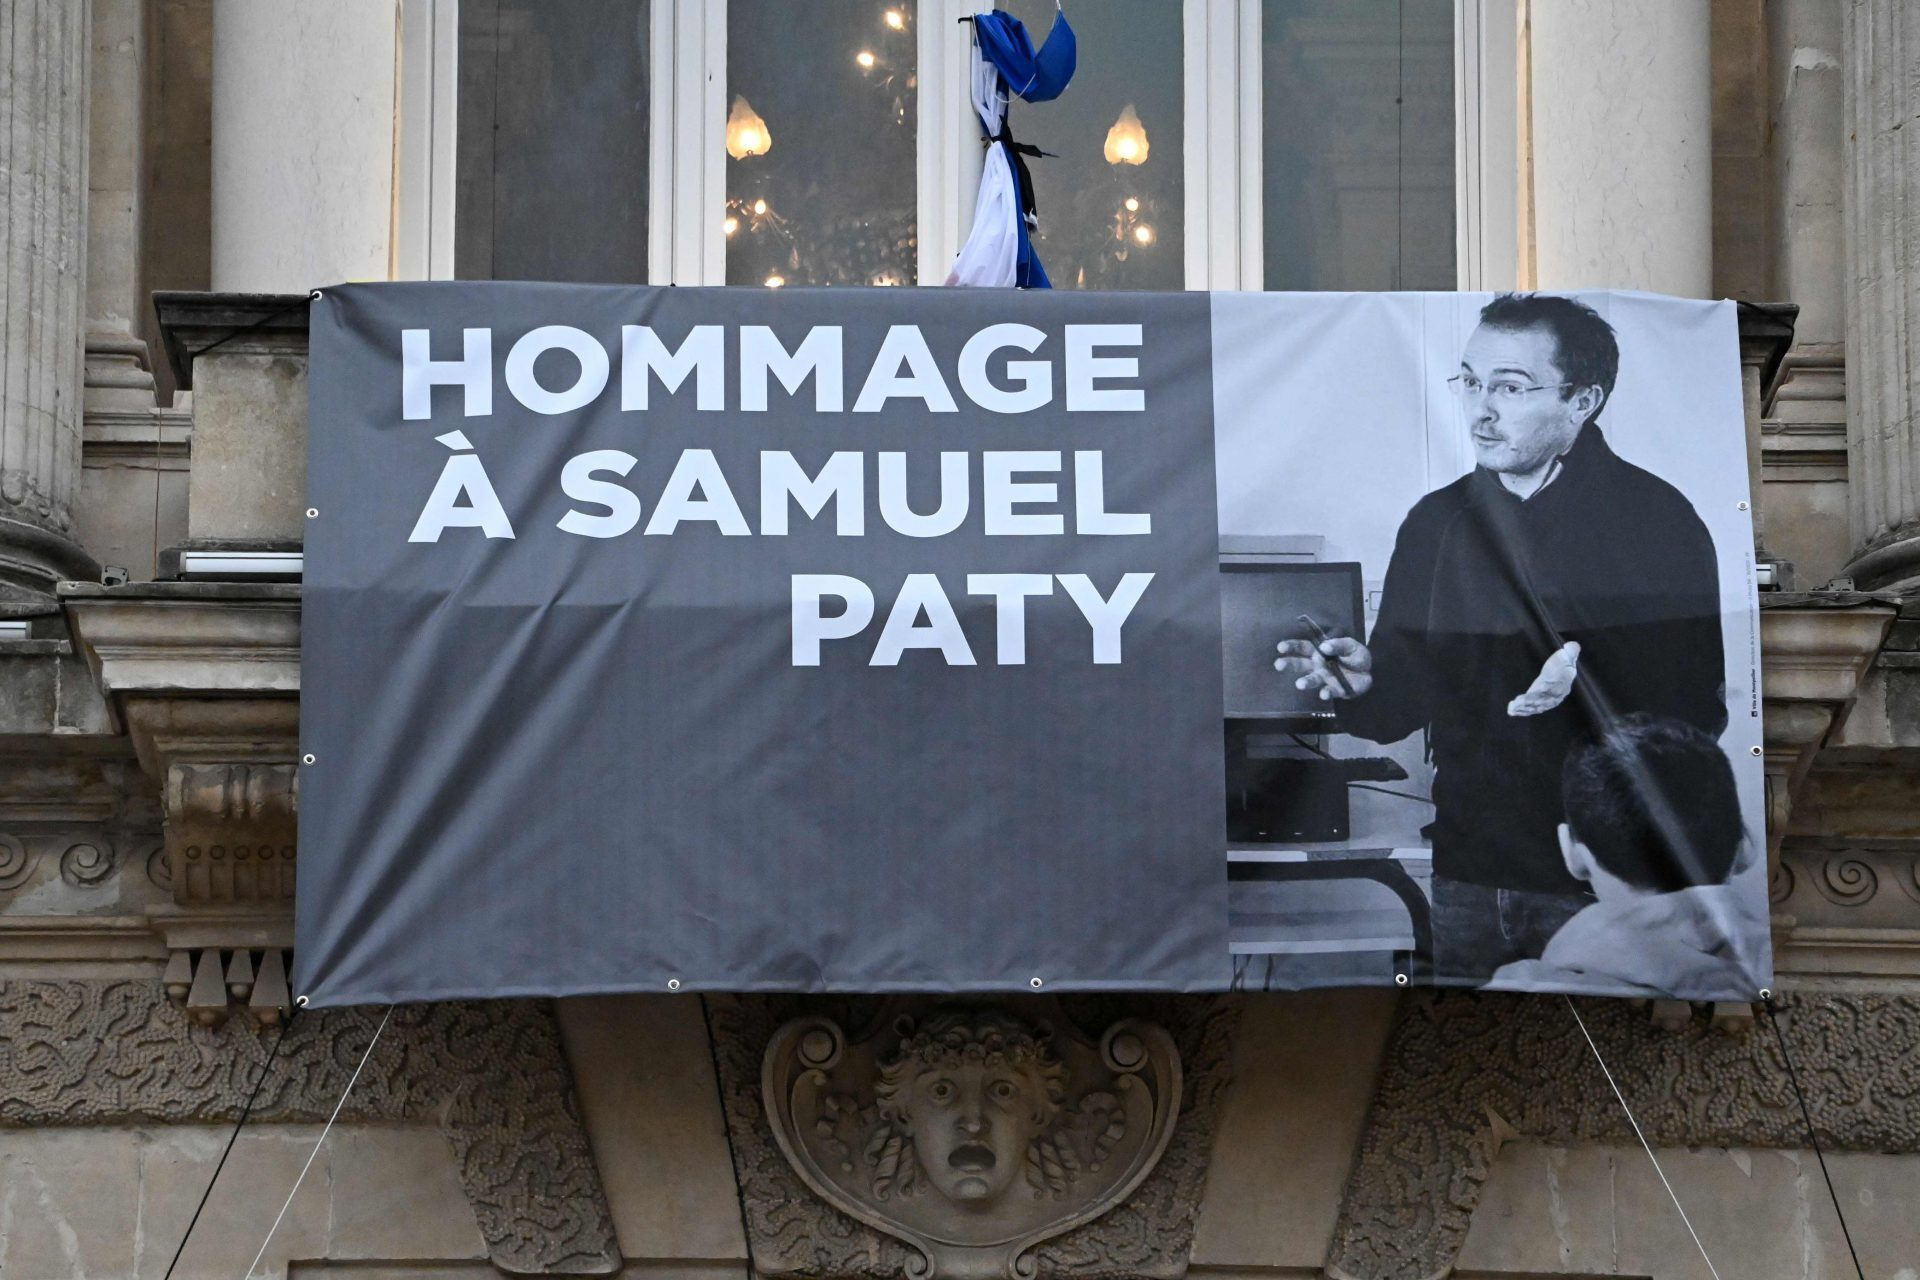 Samuel-Paty-1.jpg